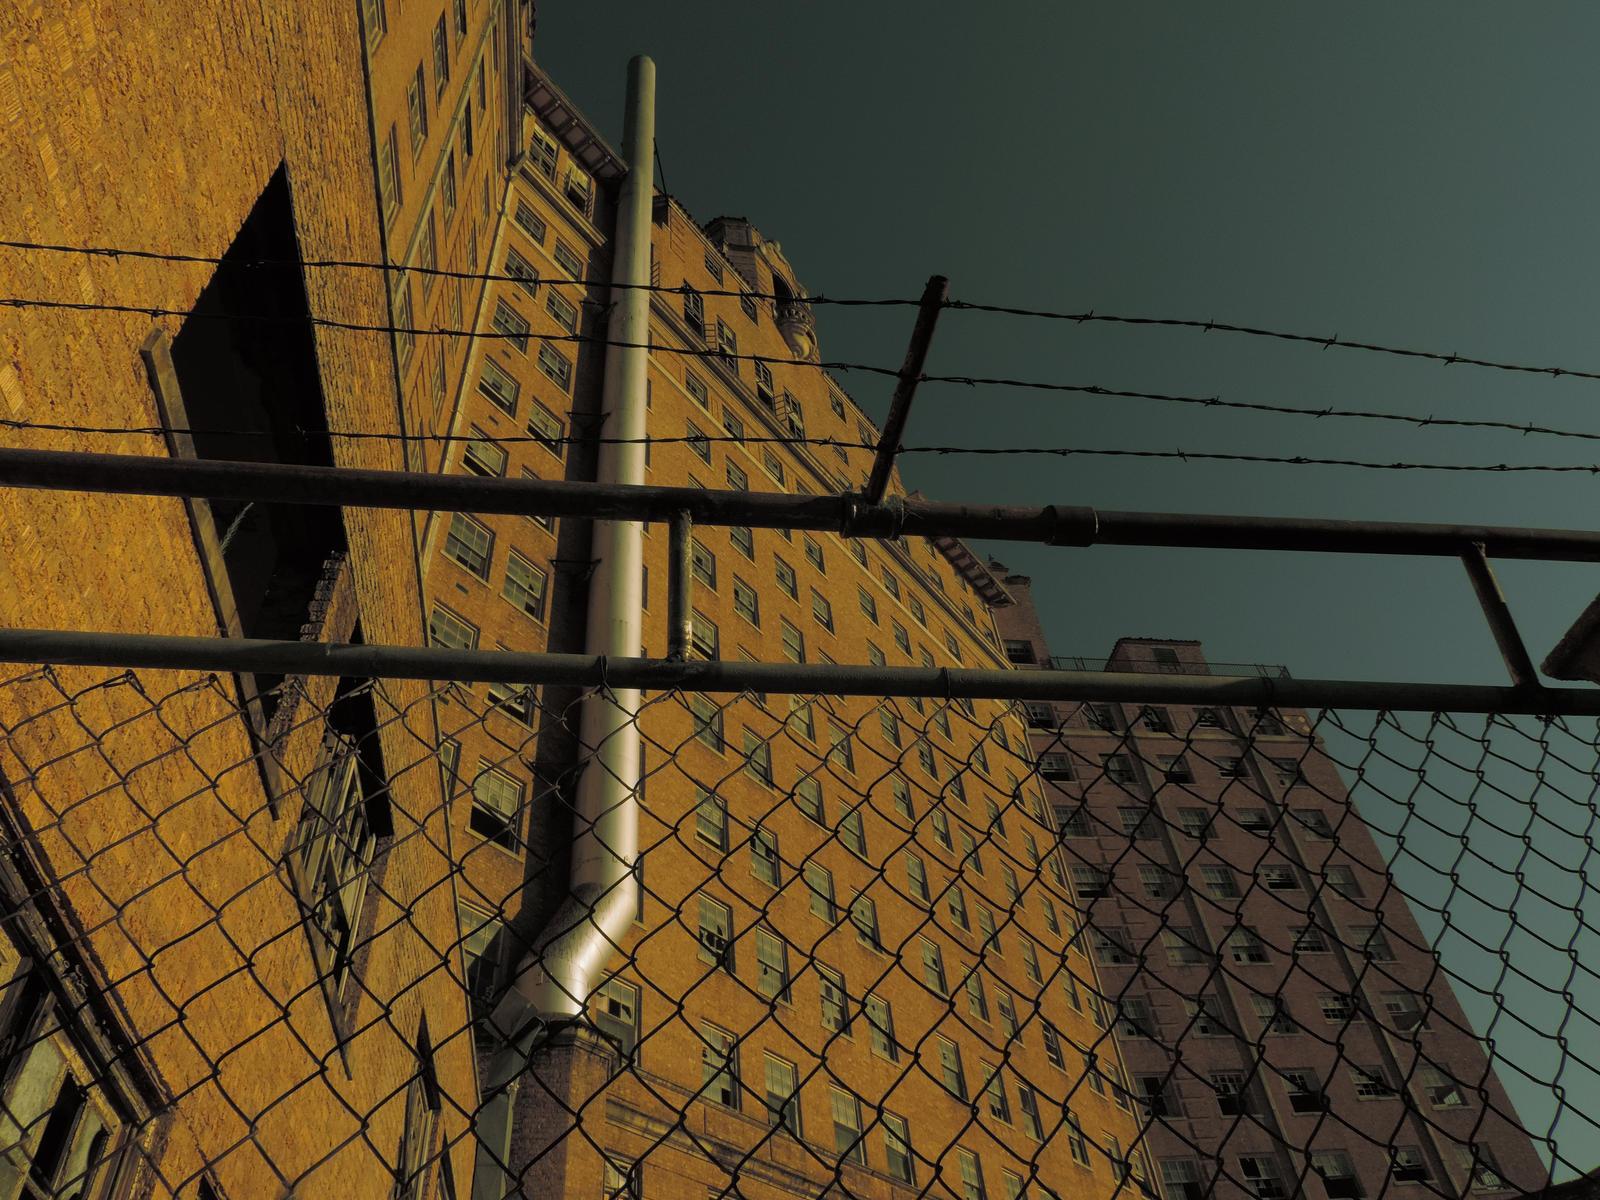 The Baker Hotel Rear View By Psycho7death On Deviantart